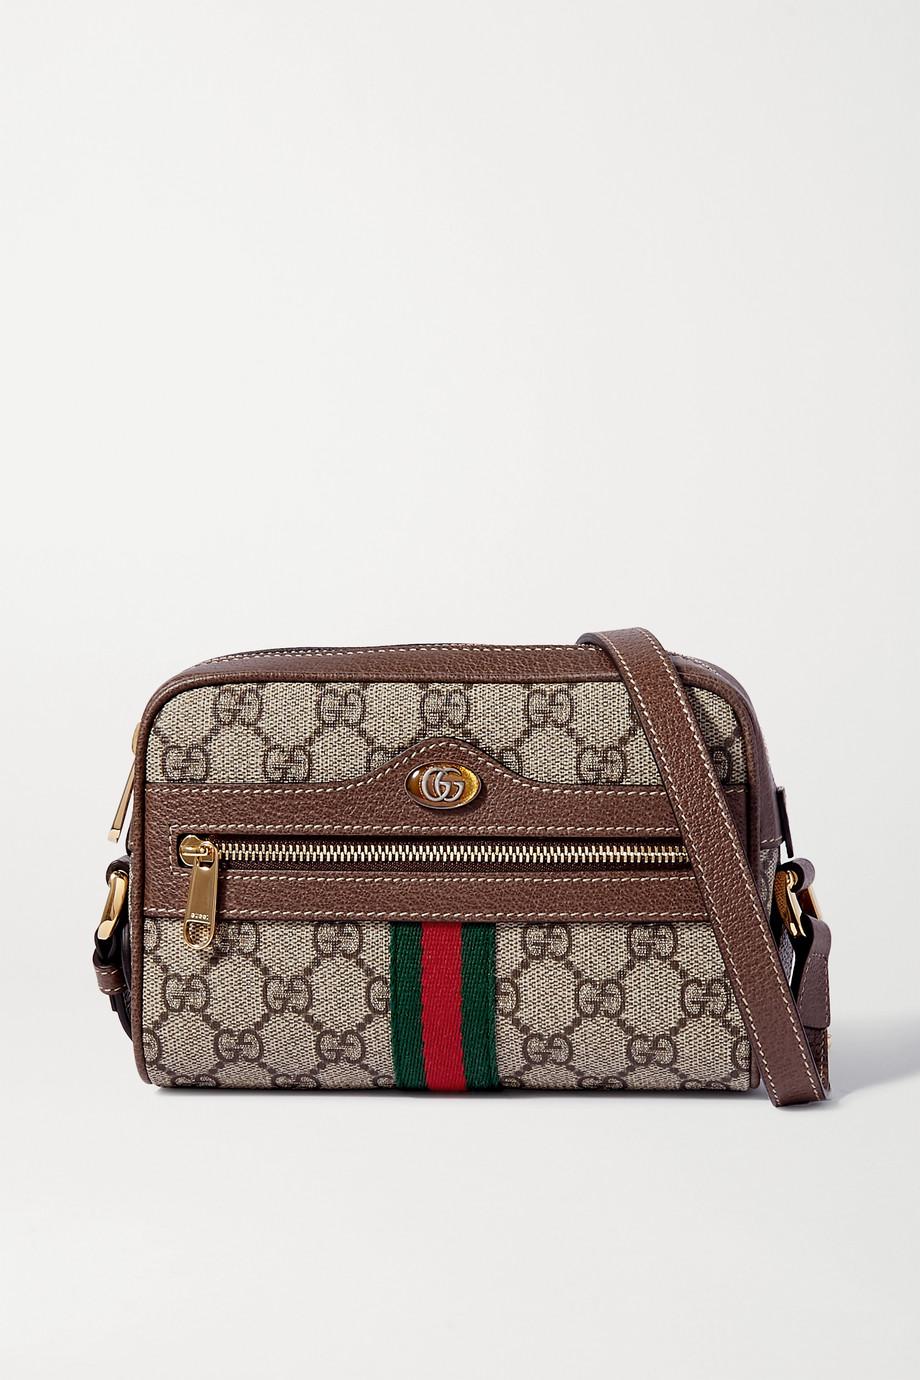 Gucci Ophidia 皮革边饰印花涂层帆布小号相机包